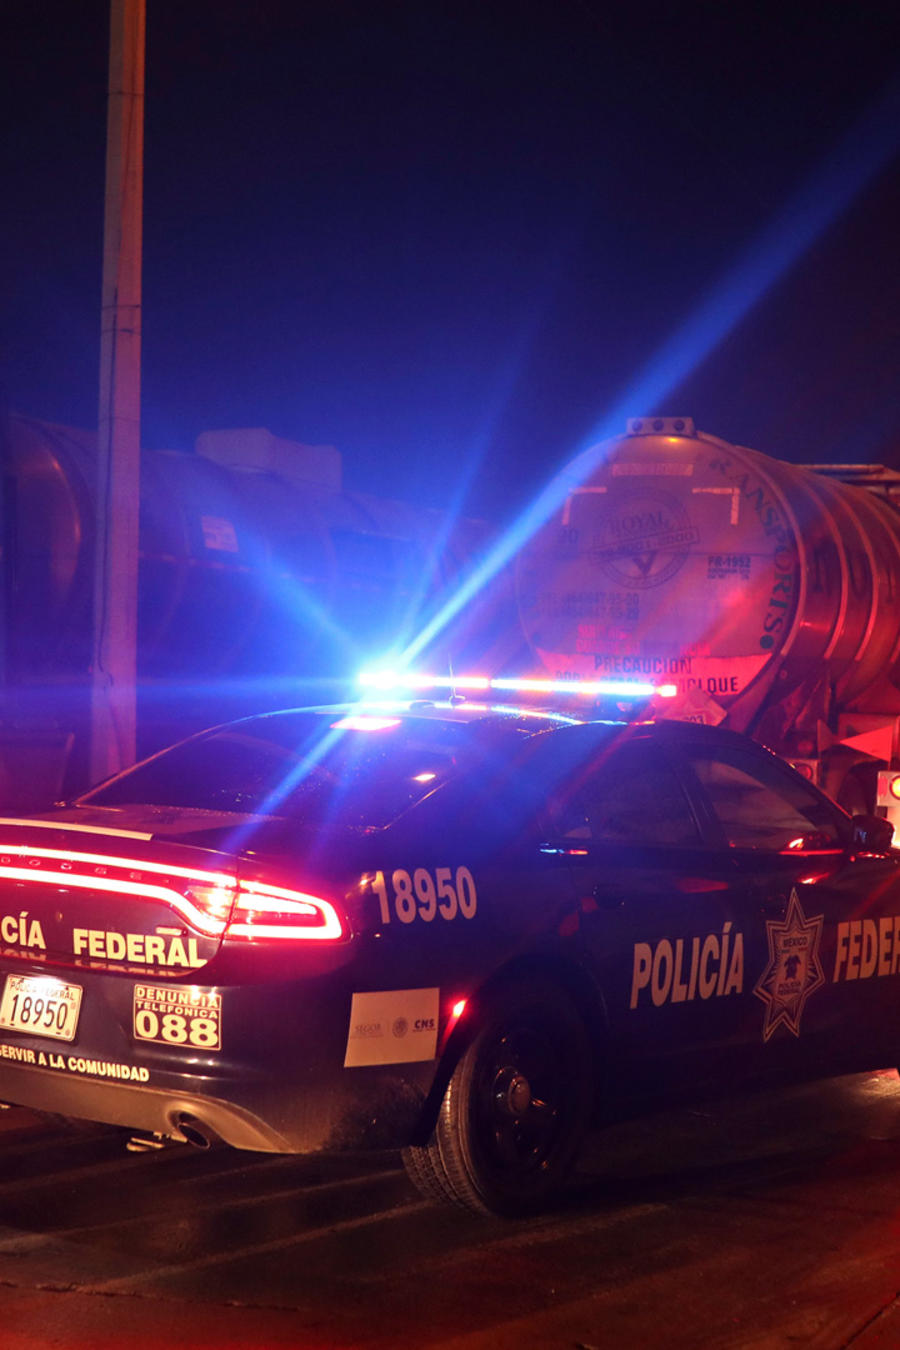 Policía de México custodia un cargamento de gasolina para evitar el robo